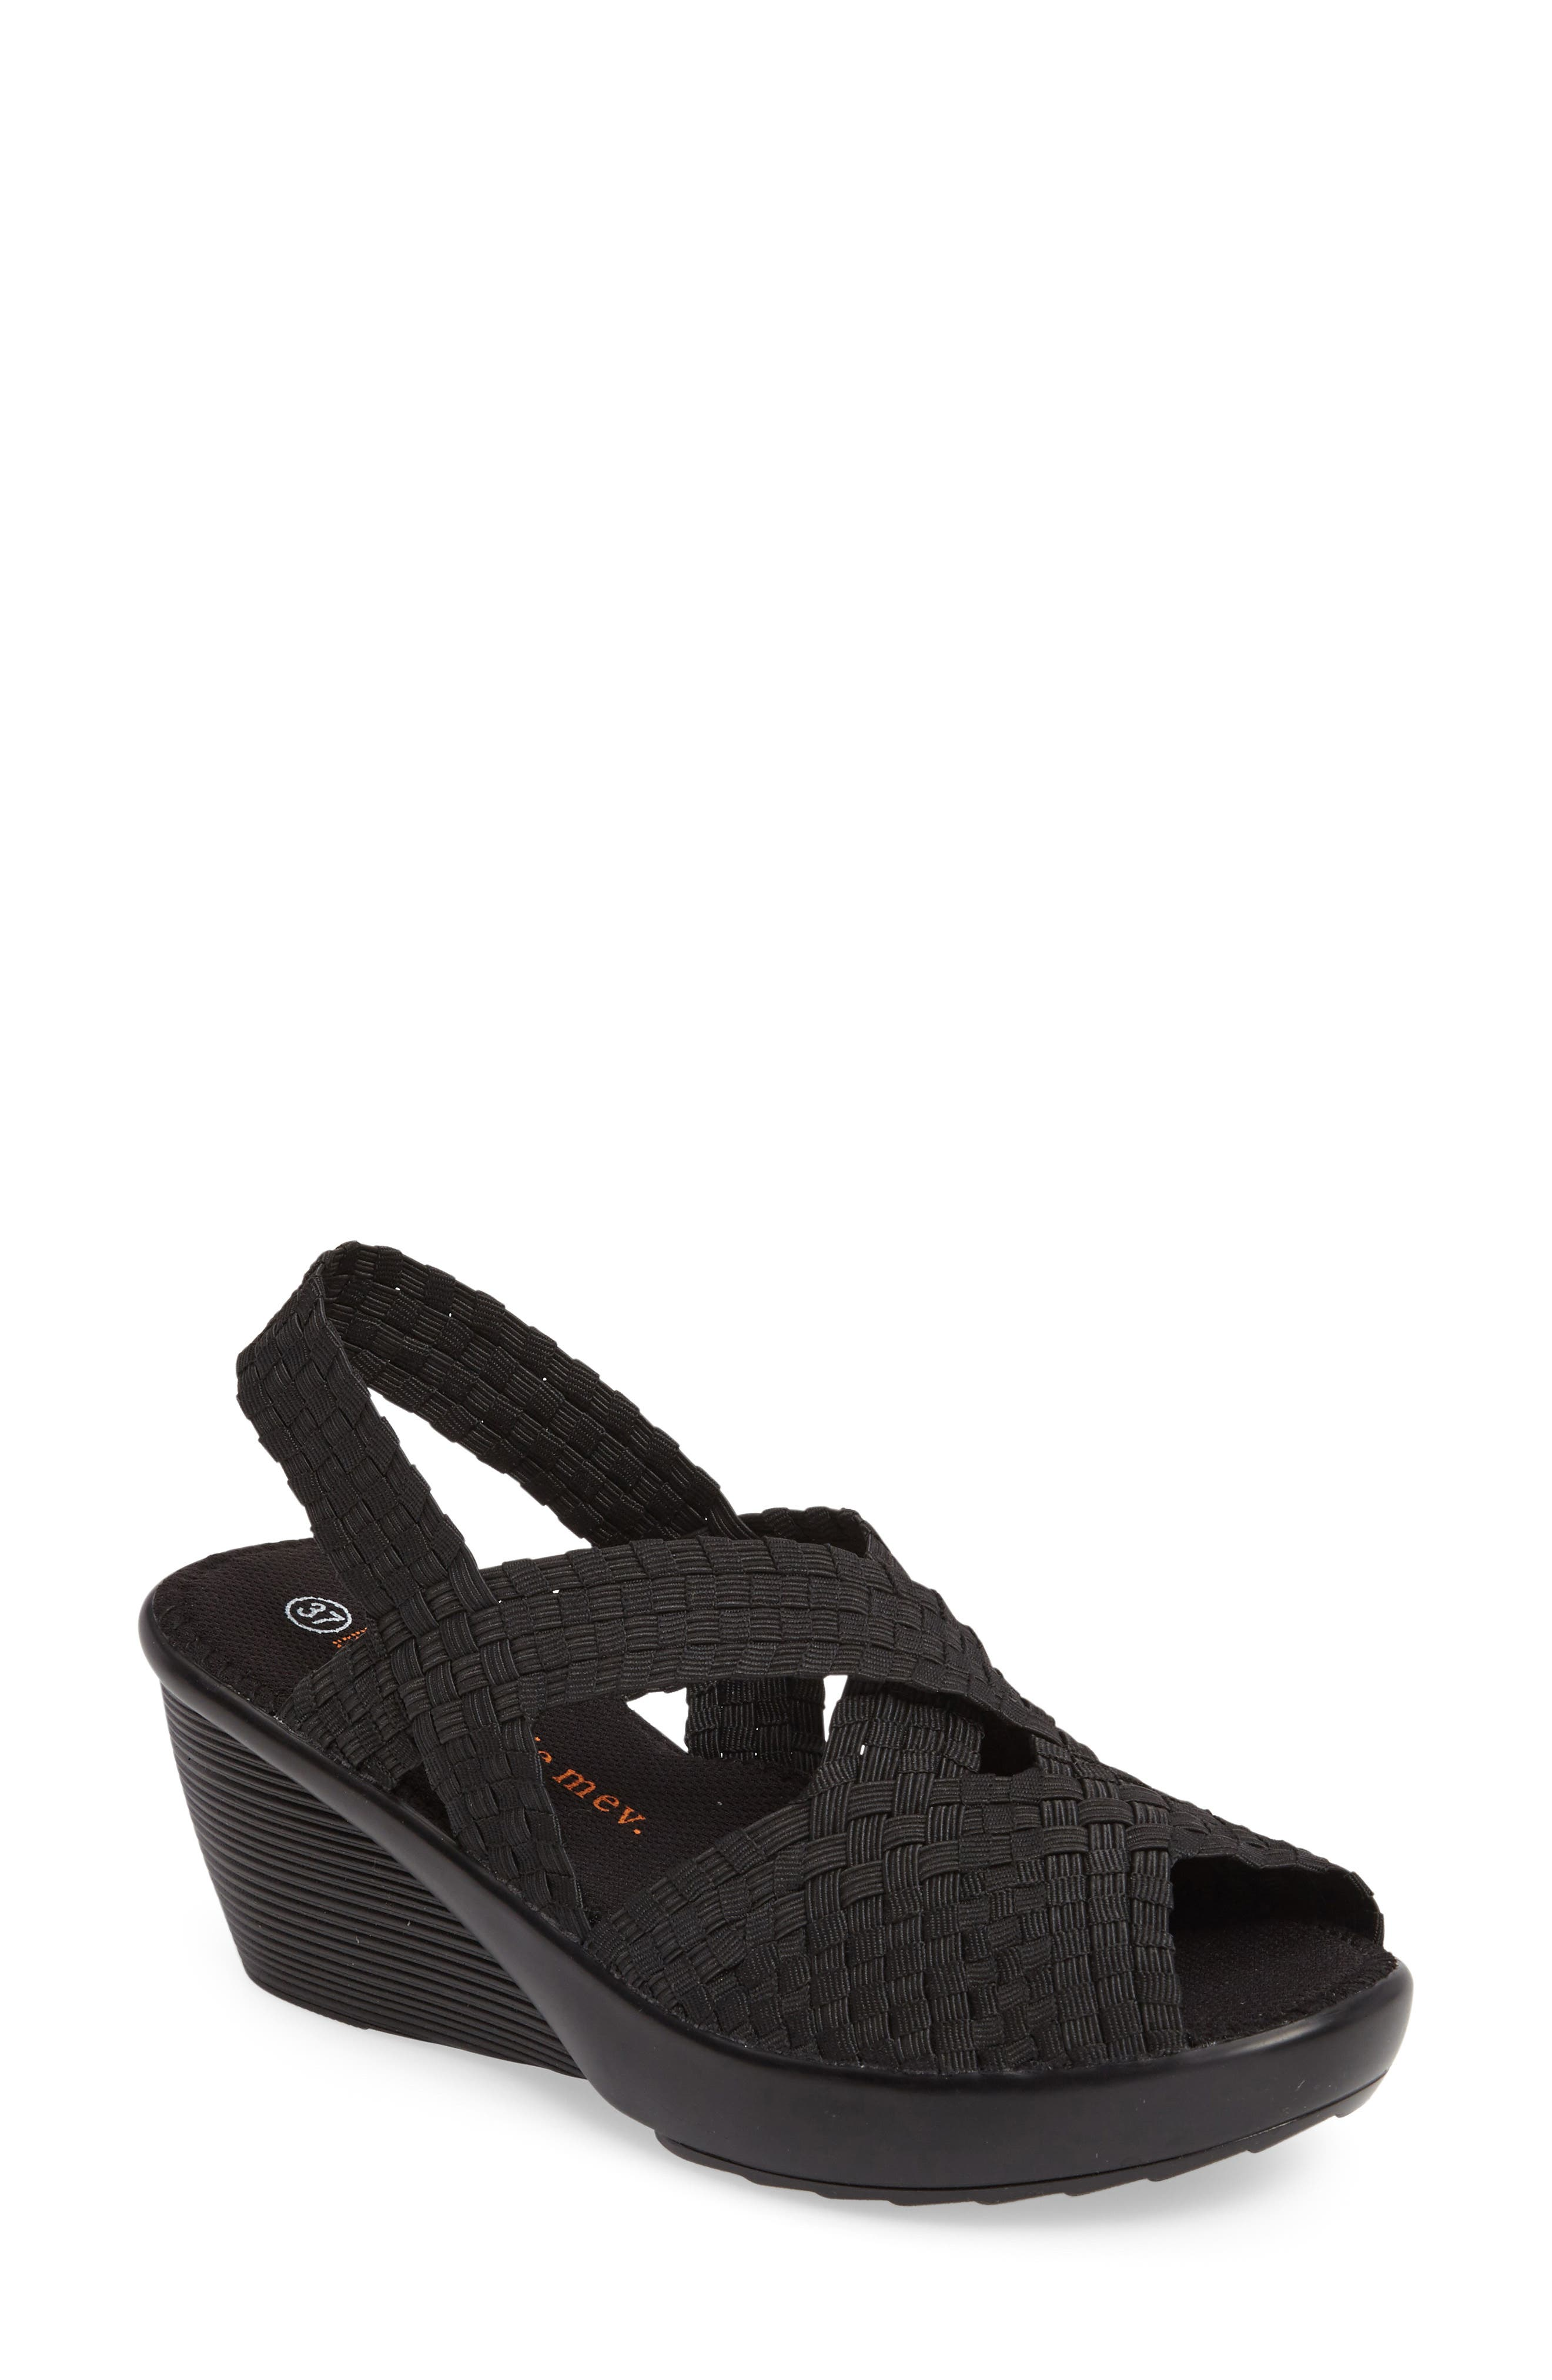 Fresh Brighten Sandal,                             Main thumbnail 1, color,                             BLACK FABRIC